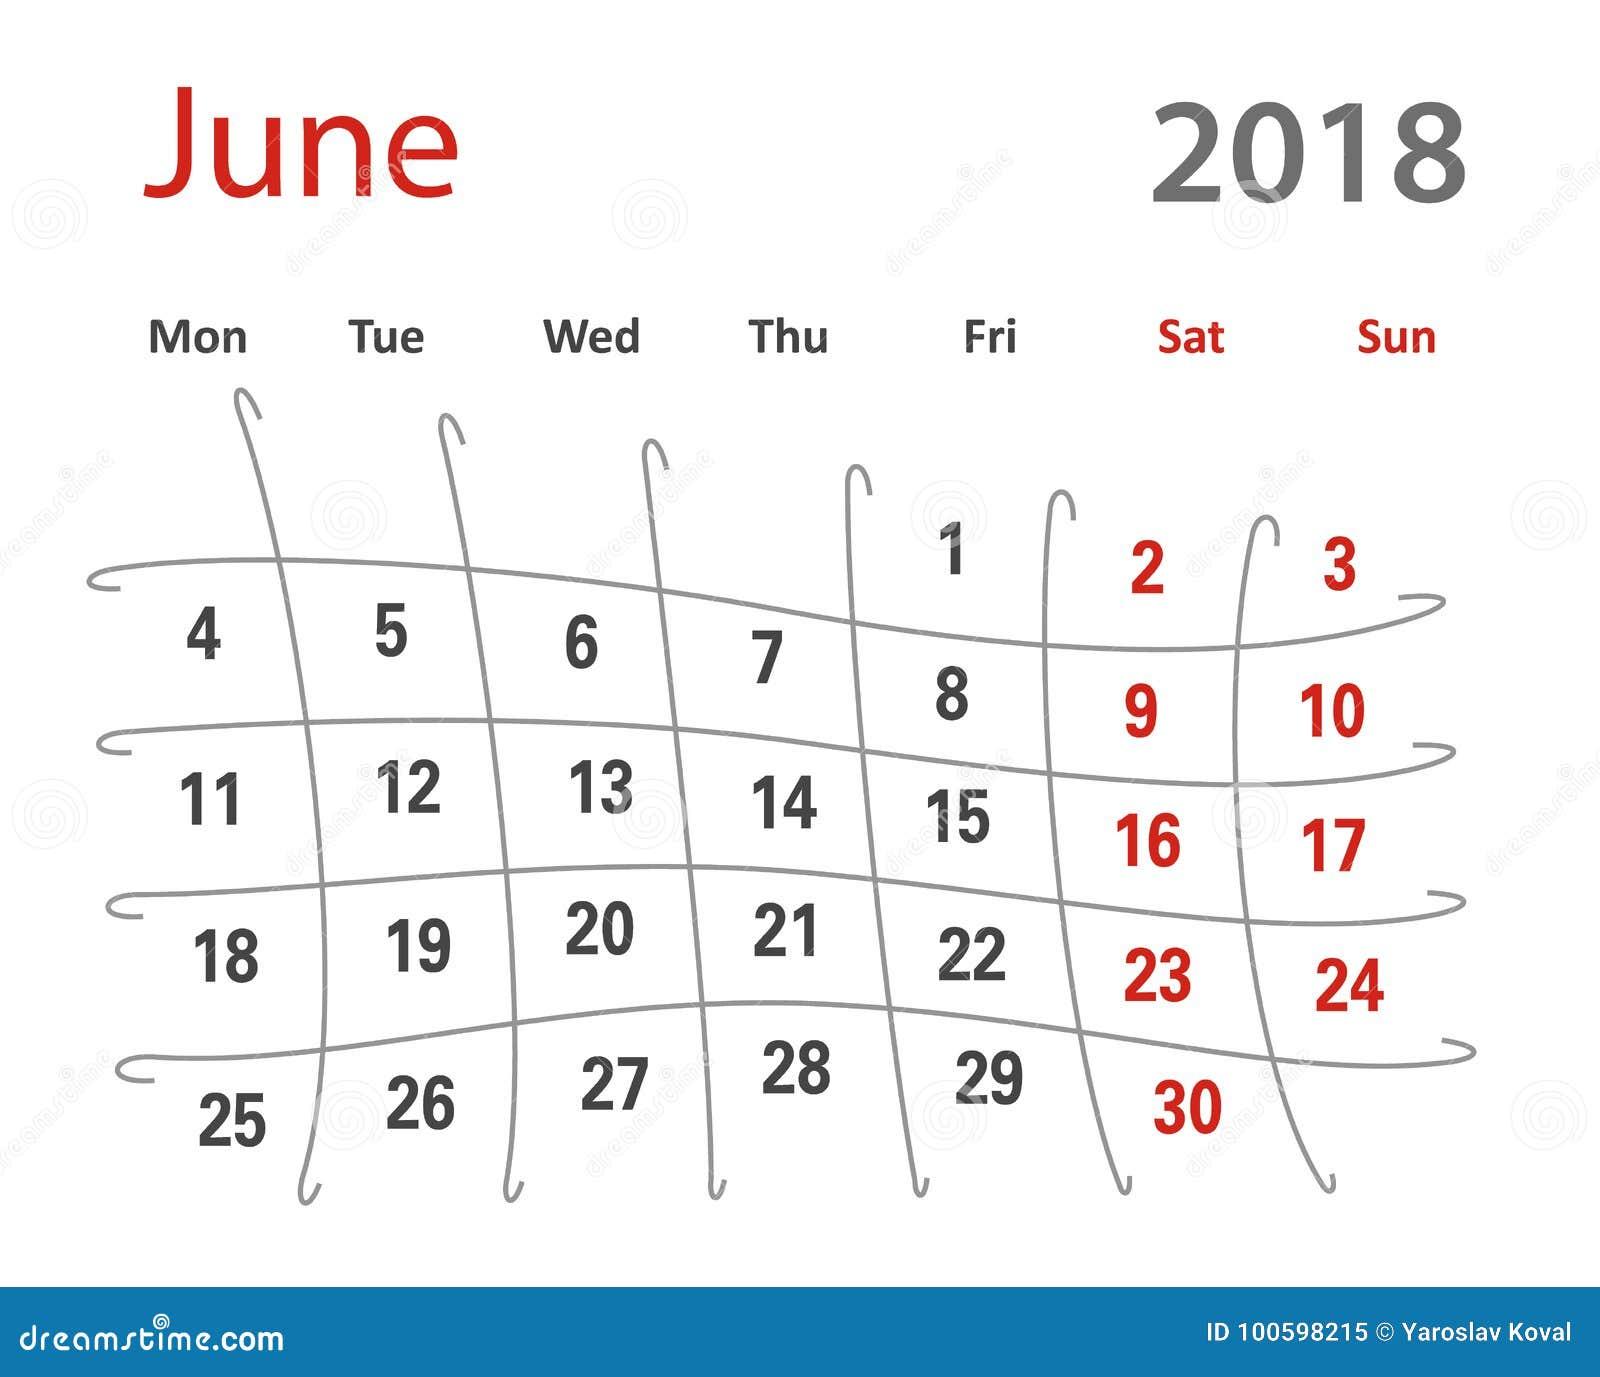 2018 funny original grid june creative calendar stock illustration